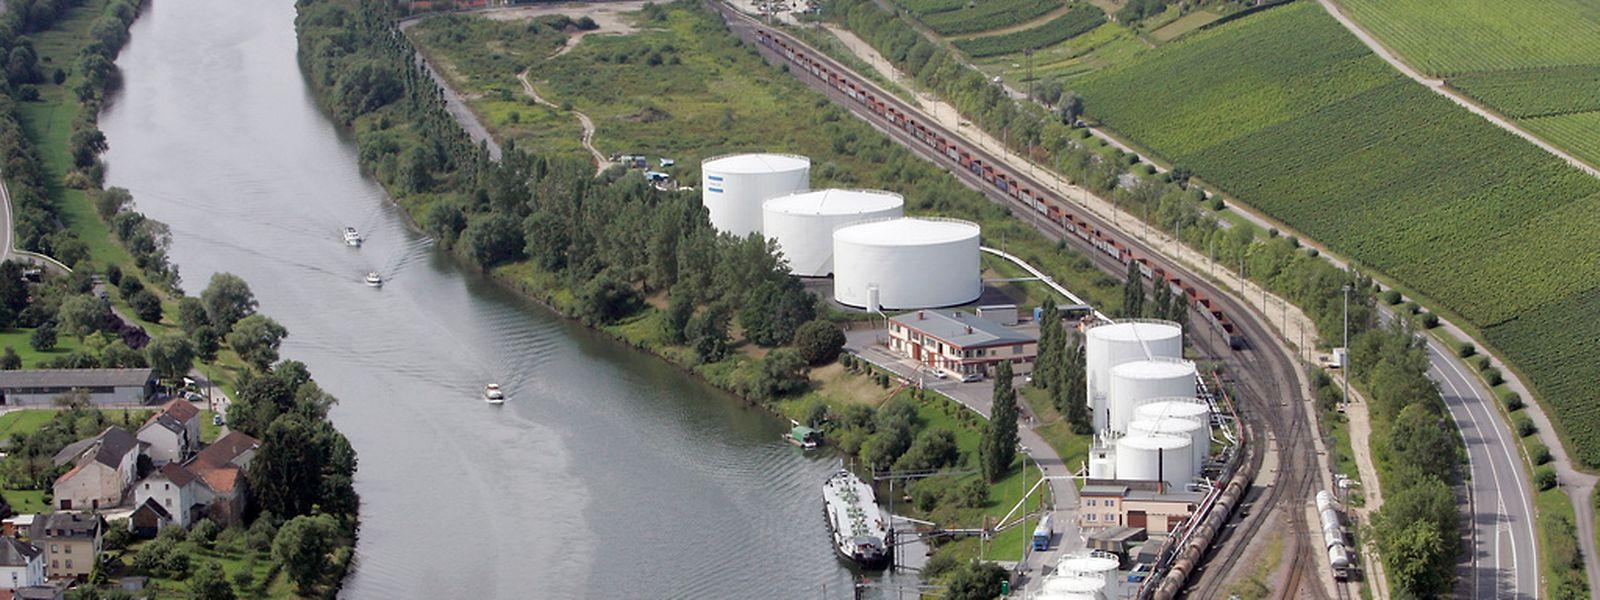 Die Tanklager in Mertert sollen ausgebaut werden.